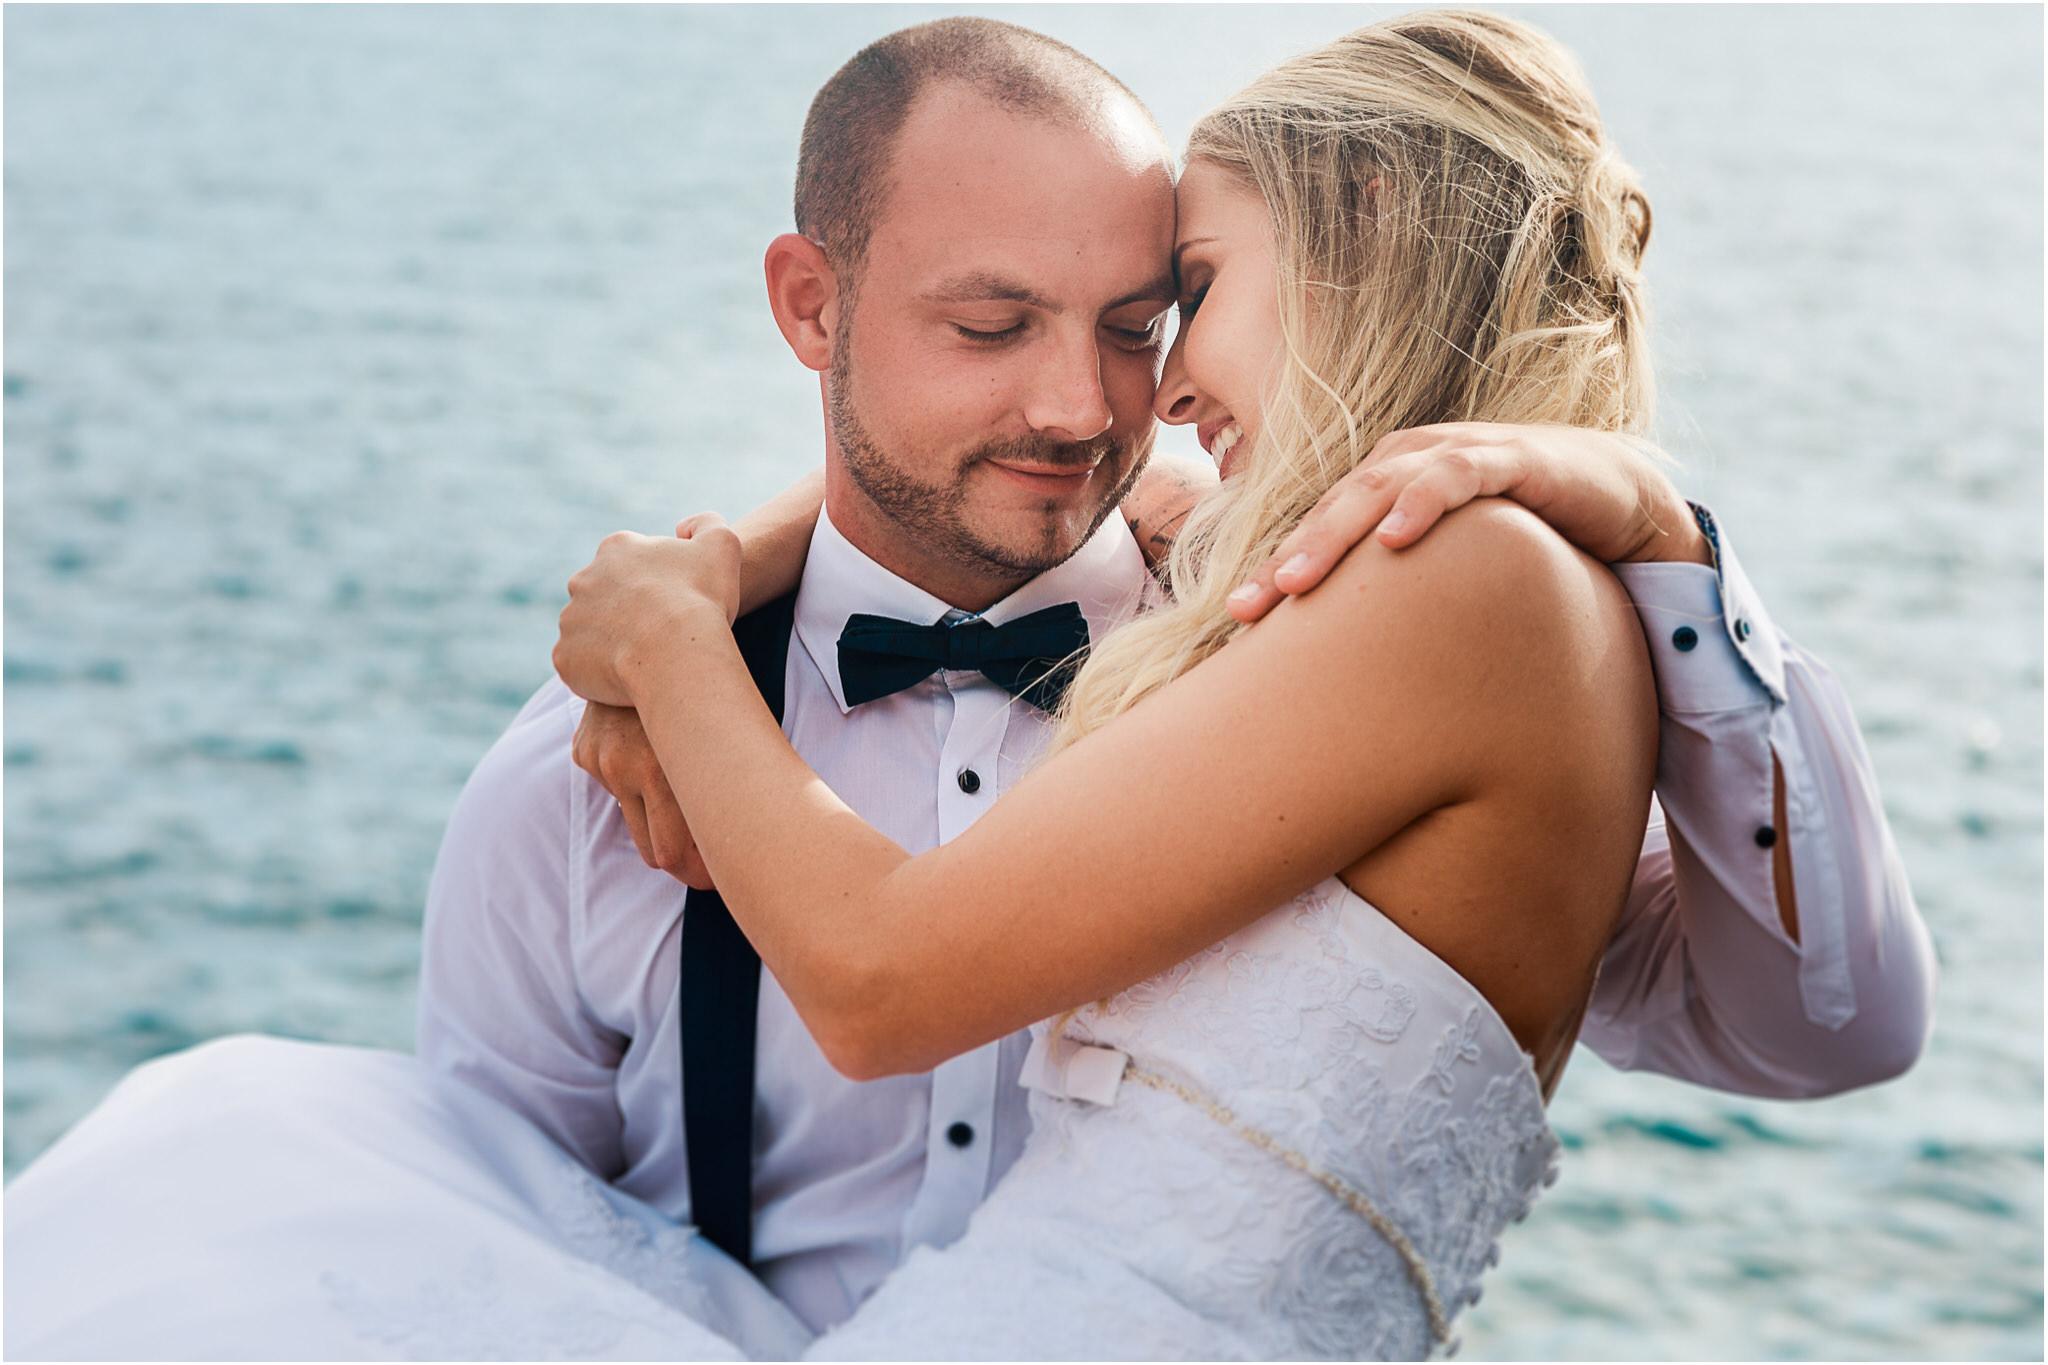 Hochzeitsfoto-Teneriffa-36.jpg